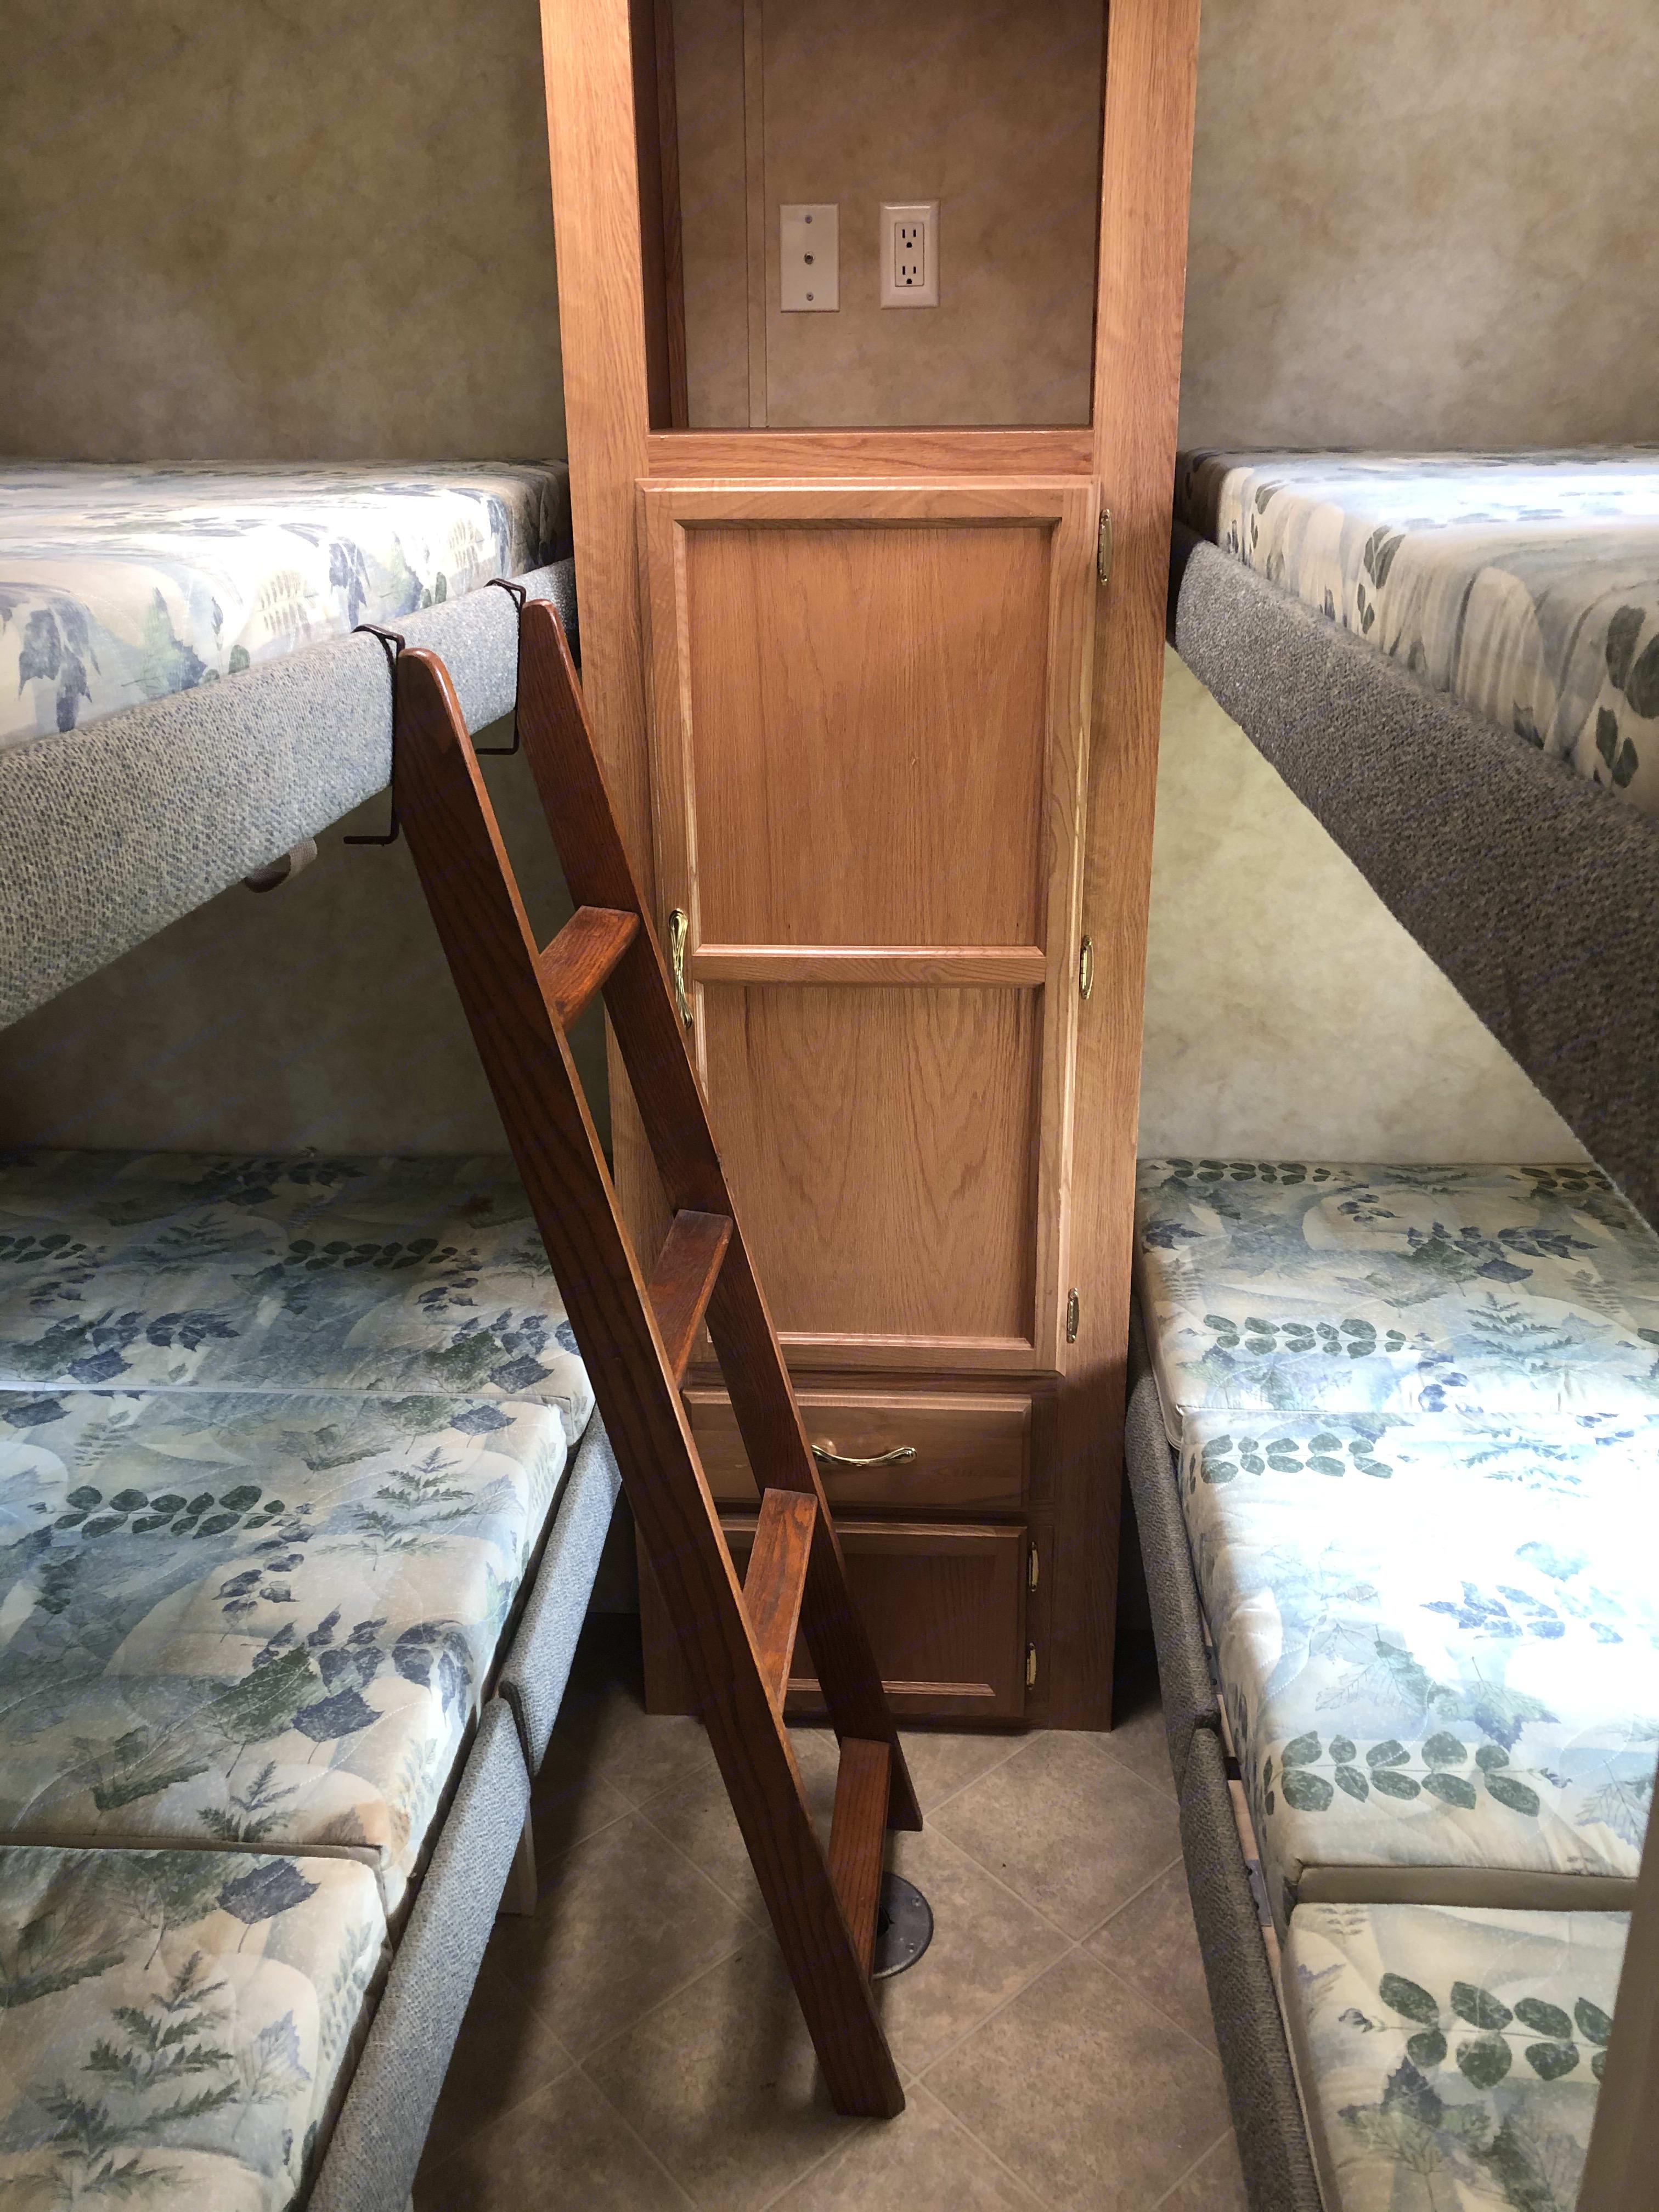 four bunks in the rear. Jayco Jay Flight 2006